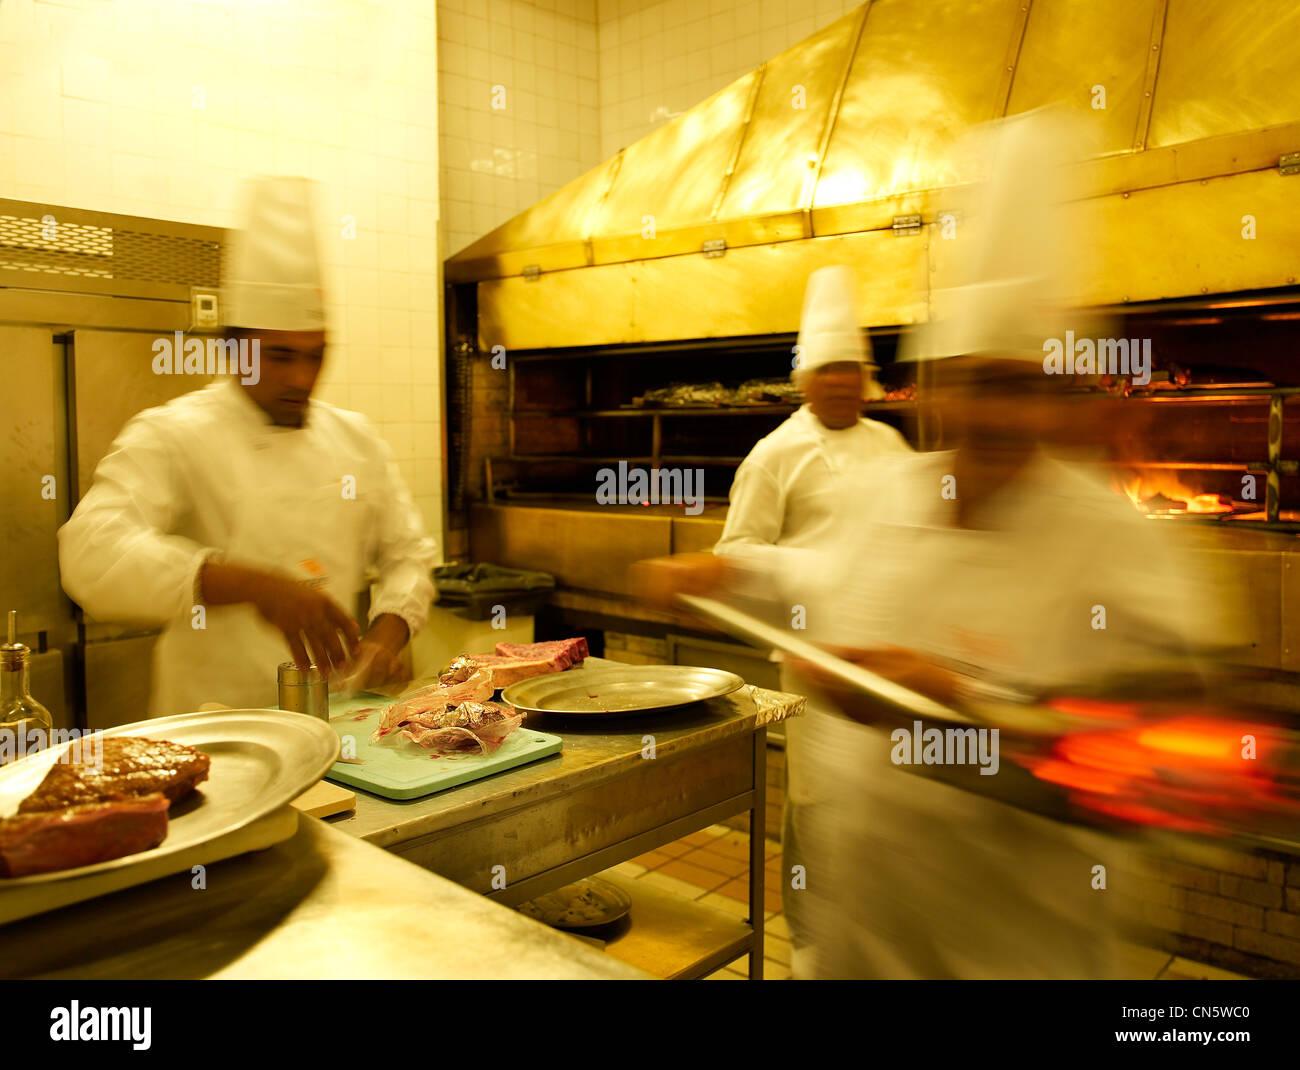 Brazil são paulo feature são paulo confidential rodeio restaurant stock image